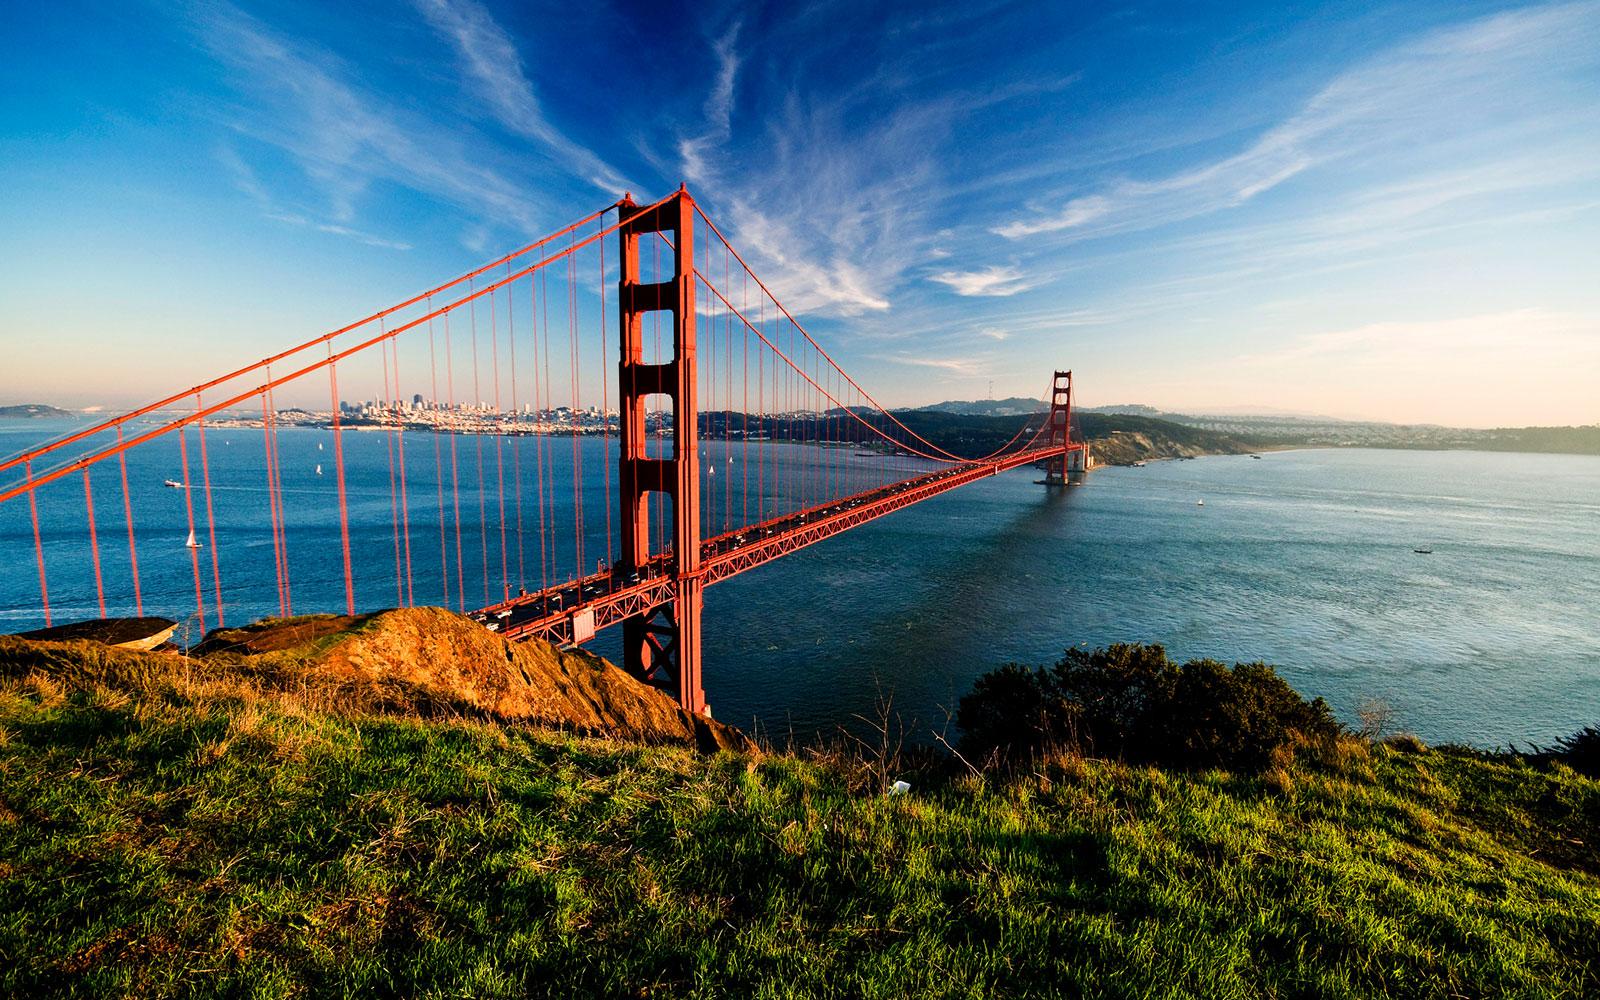 golden-gate-bridge-of-san-francisco-california-top.jpg